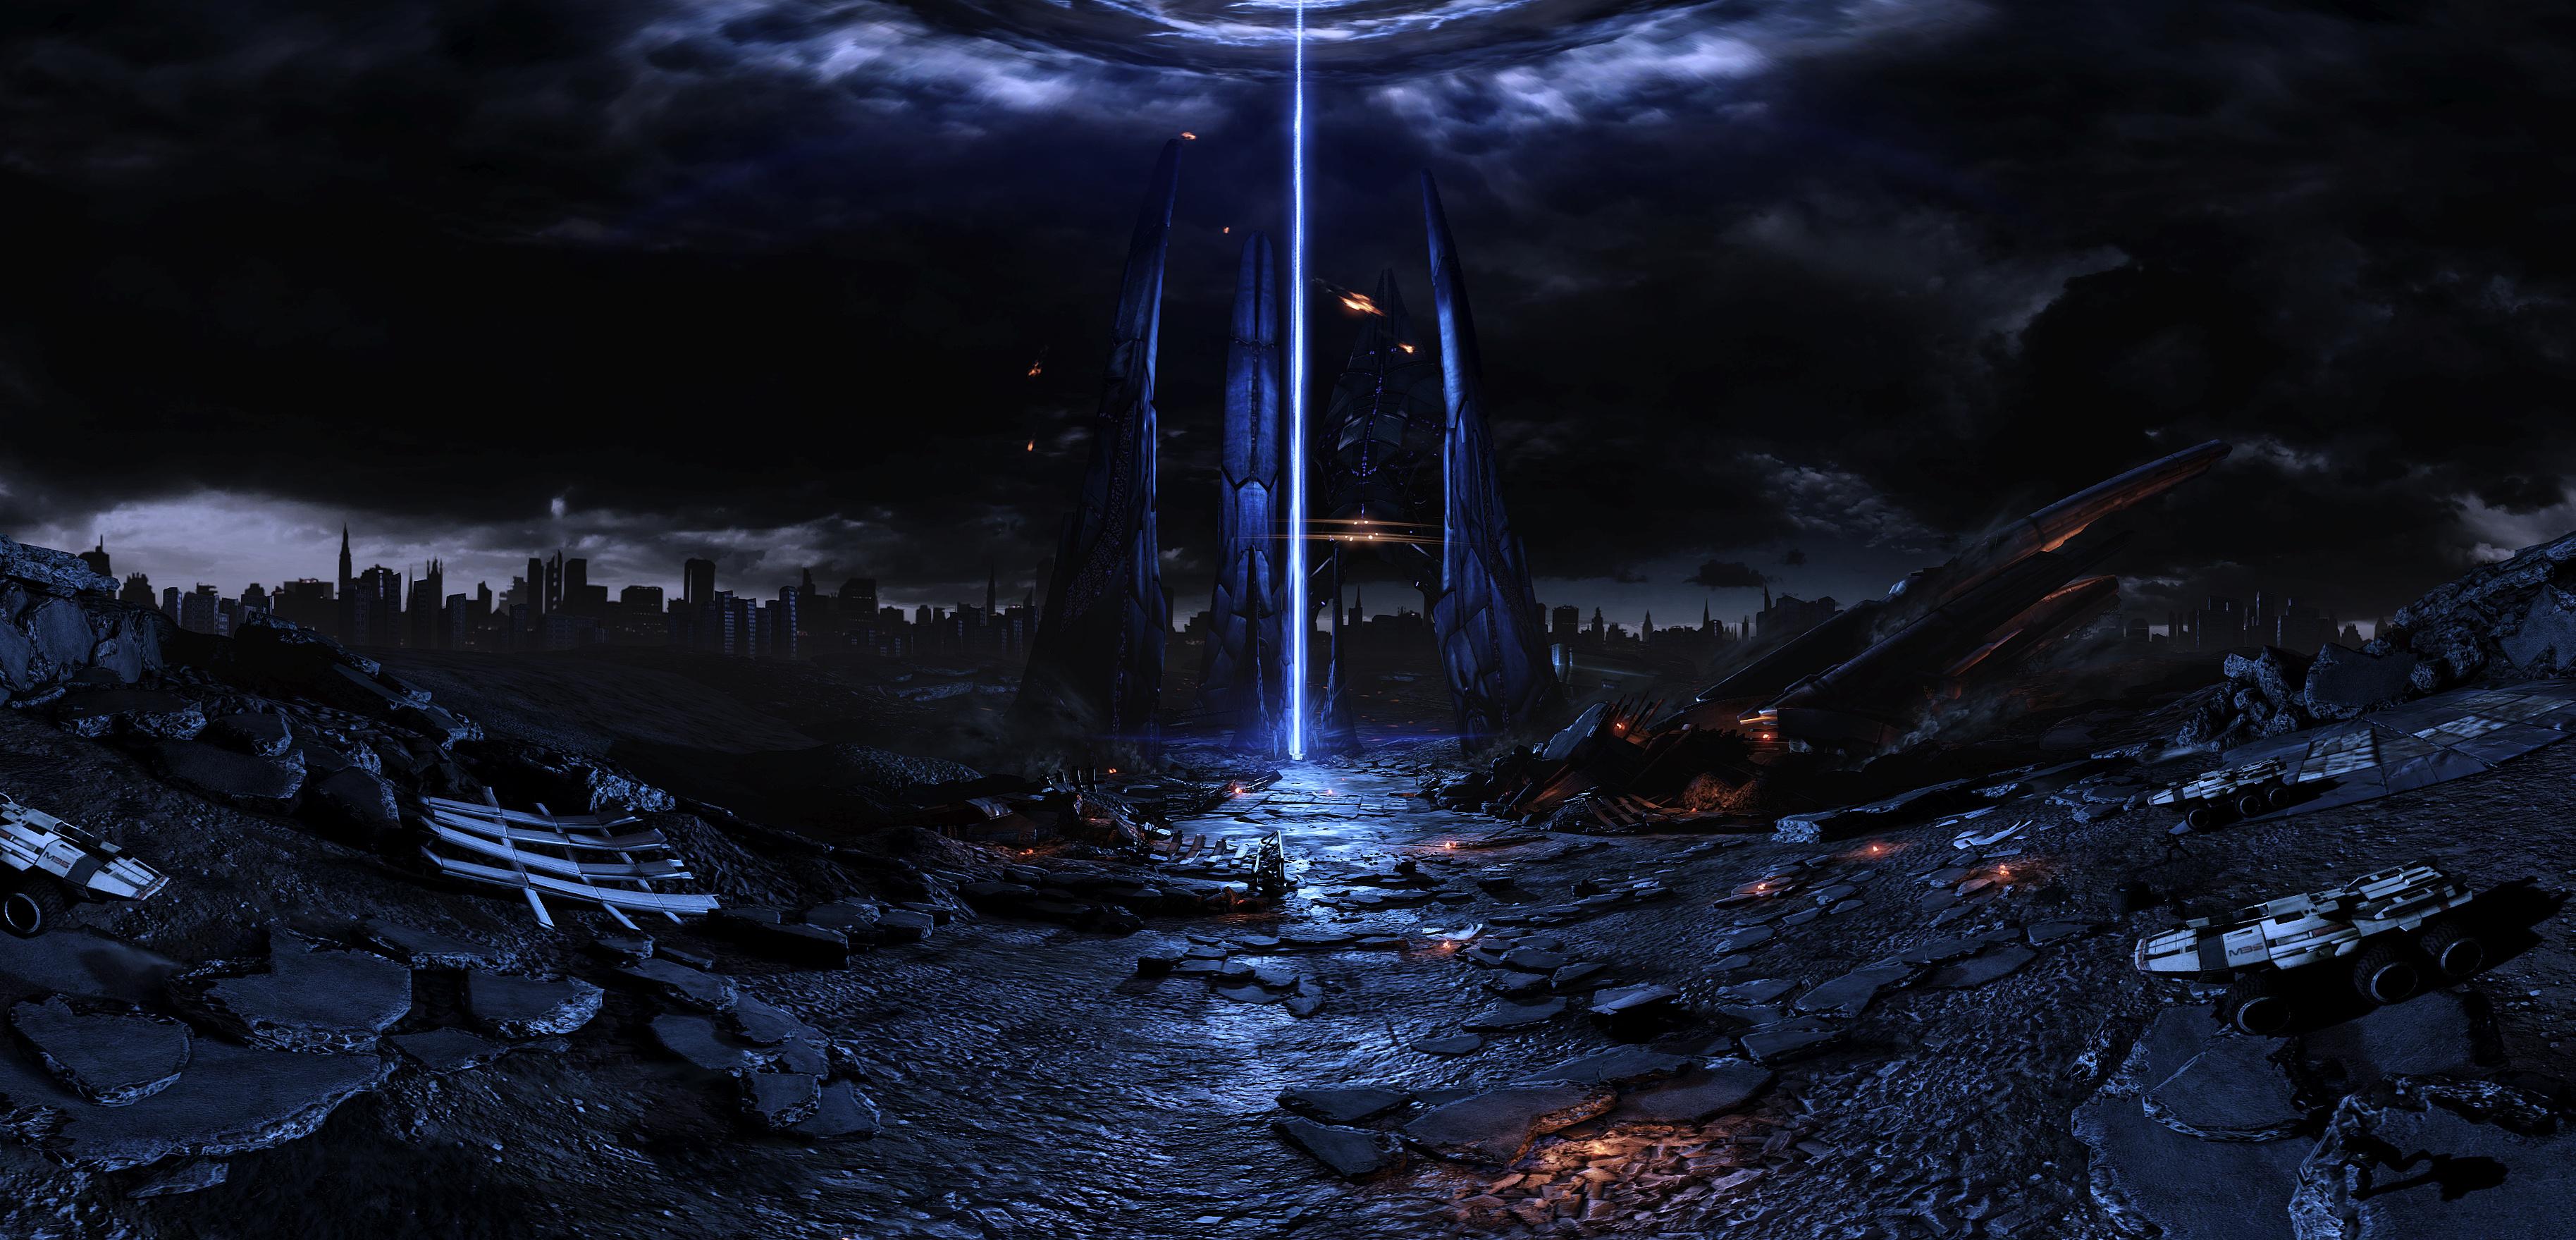 Mass effect fan reaper harbinger art pano spaceship sci-fi